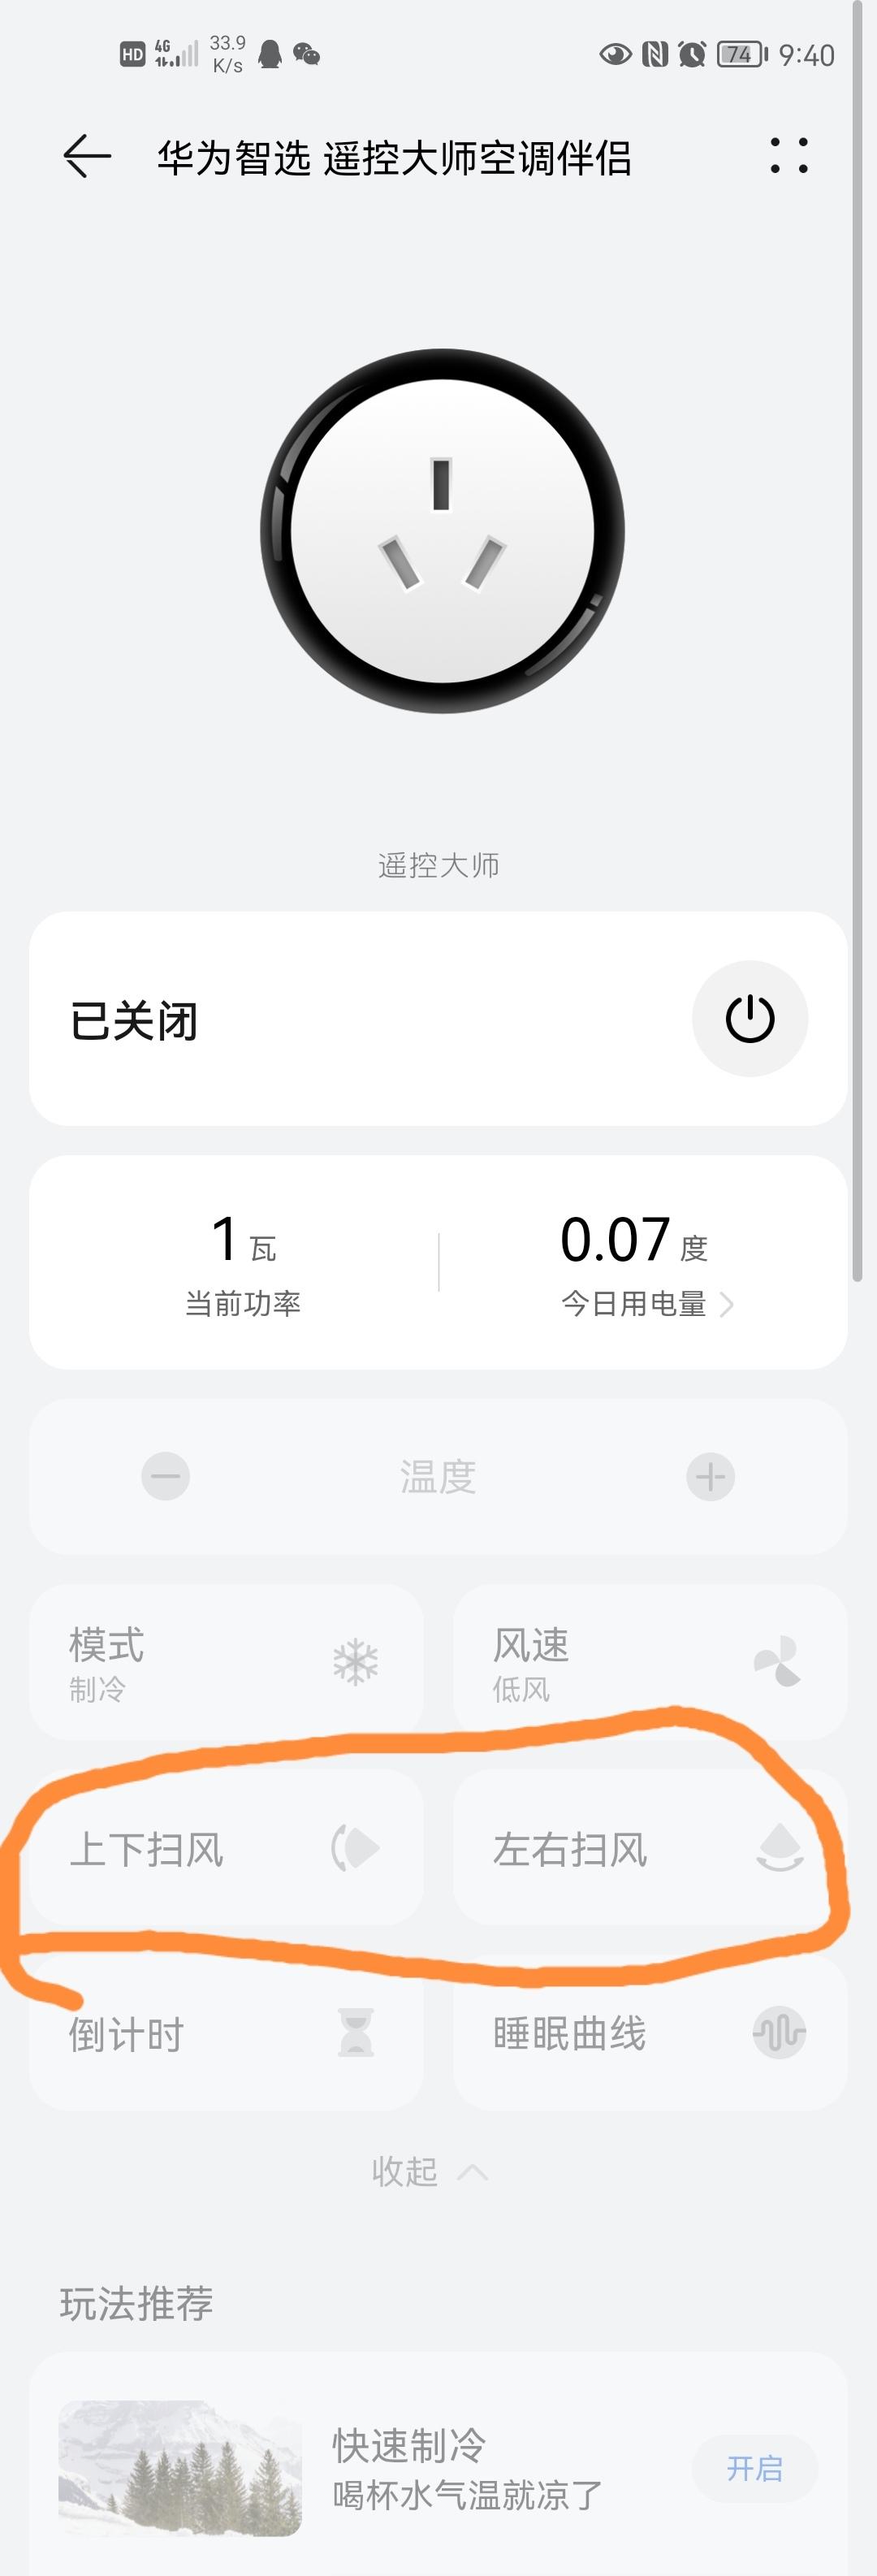 Screenshot_20210912_094018_com.huawei.smarthome_edit_30301492831834.jpg